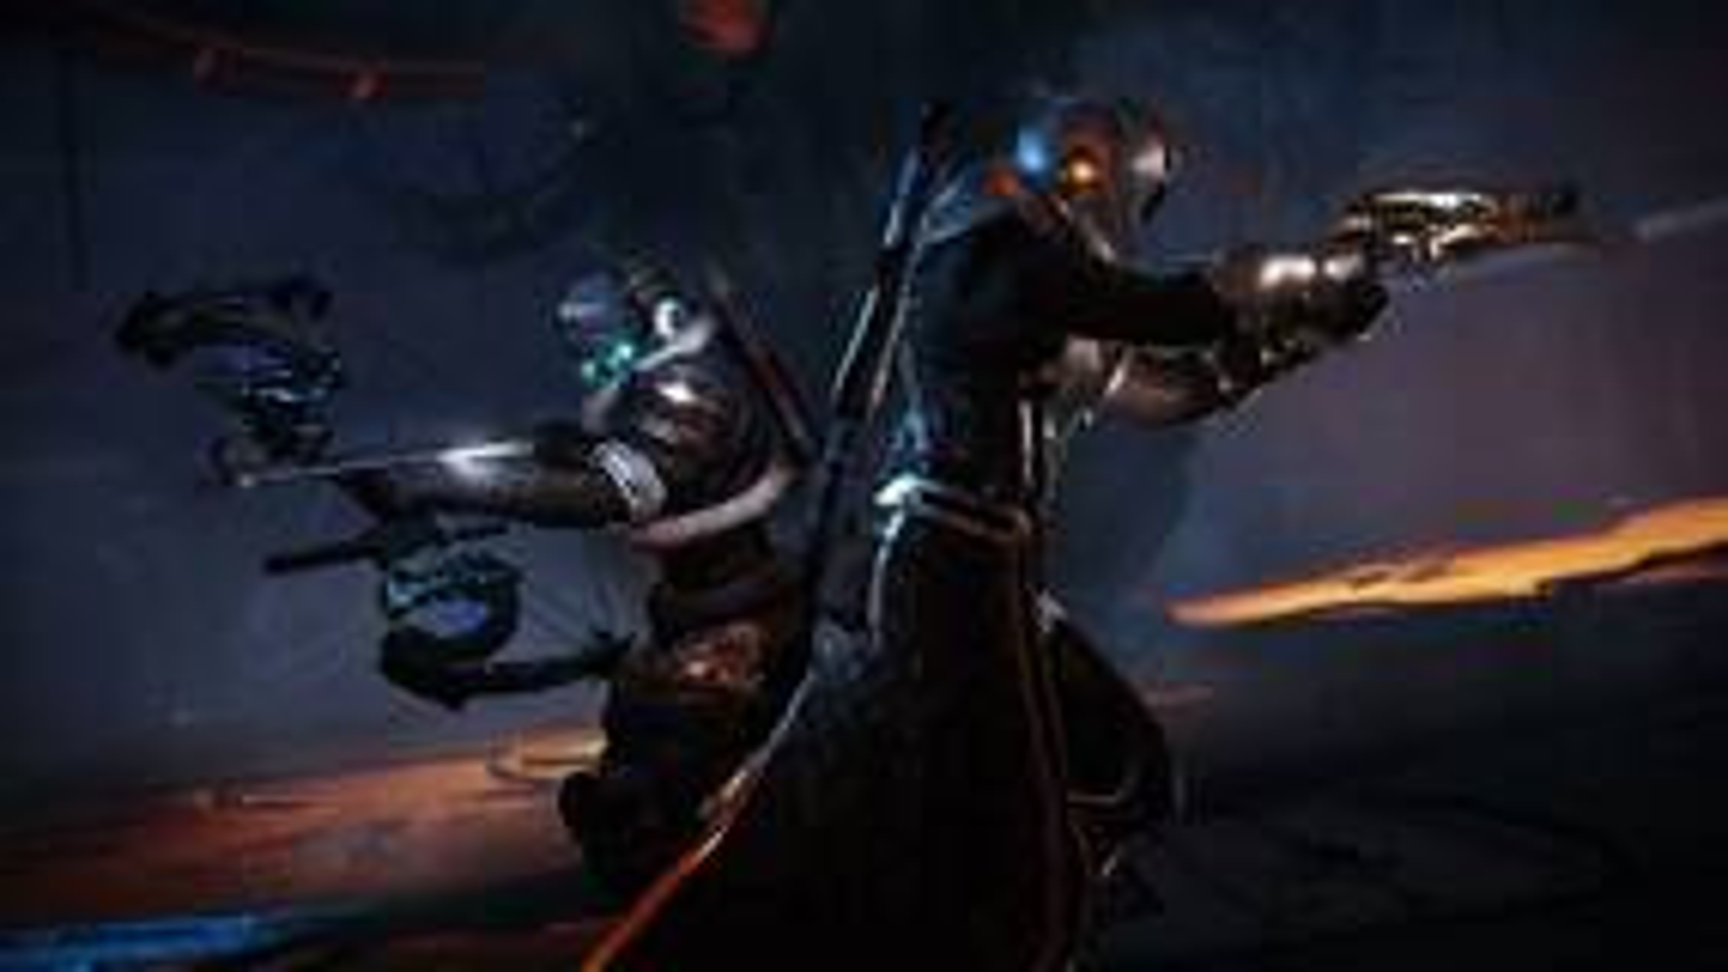 Image for Destiny 2, God of War 3: Remastered lead PlayStation Plus September lineup